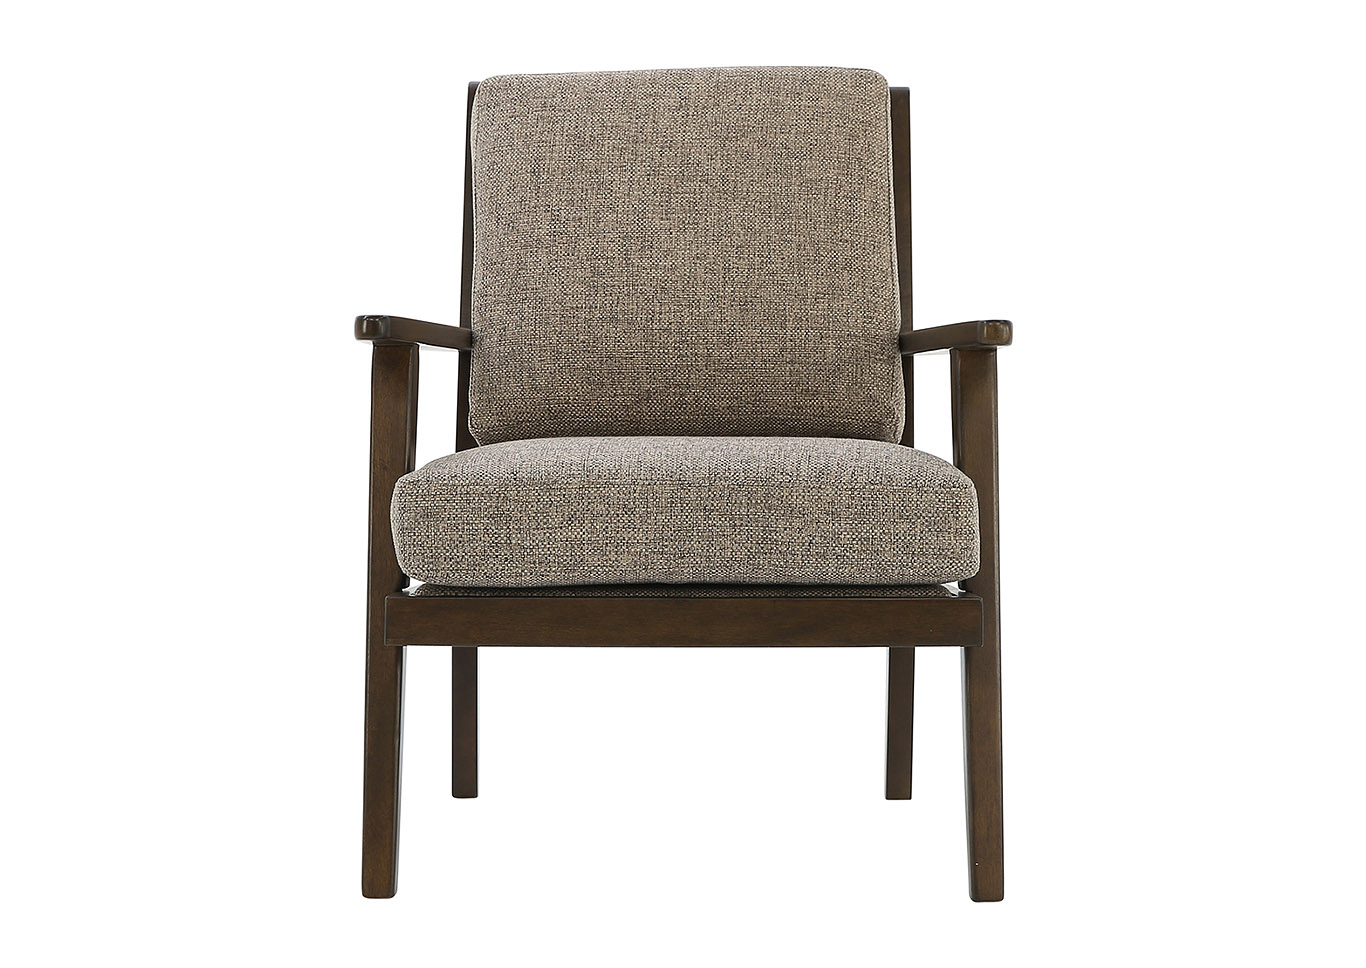 Amazing Ivan Smith Dahra Jute Accent Chair Pabps2019 Chair Design Images Pabps2019Com